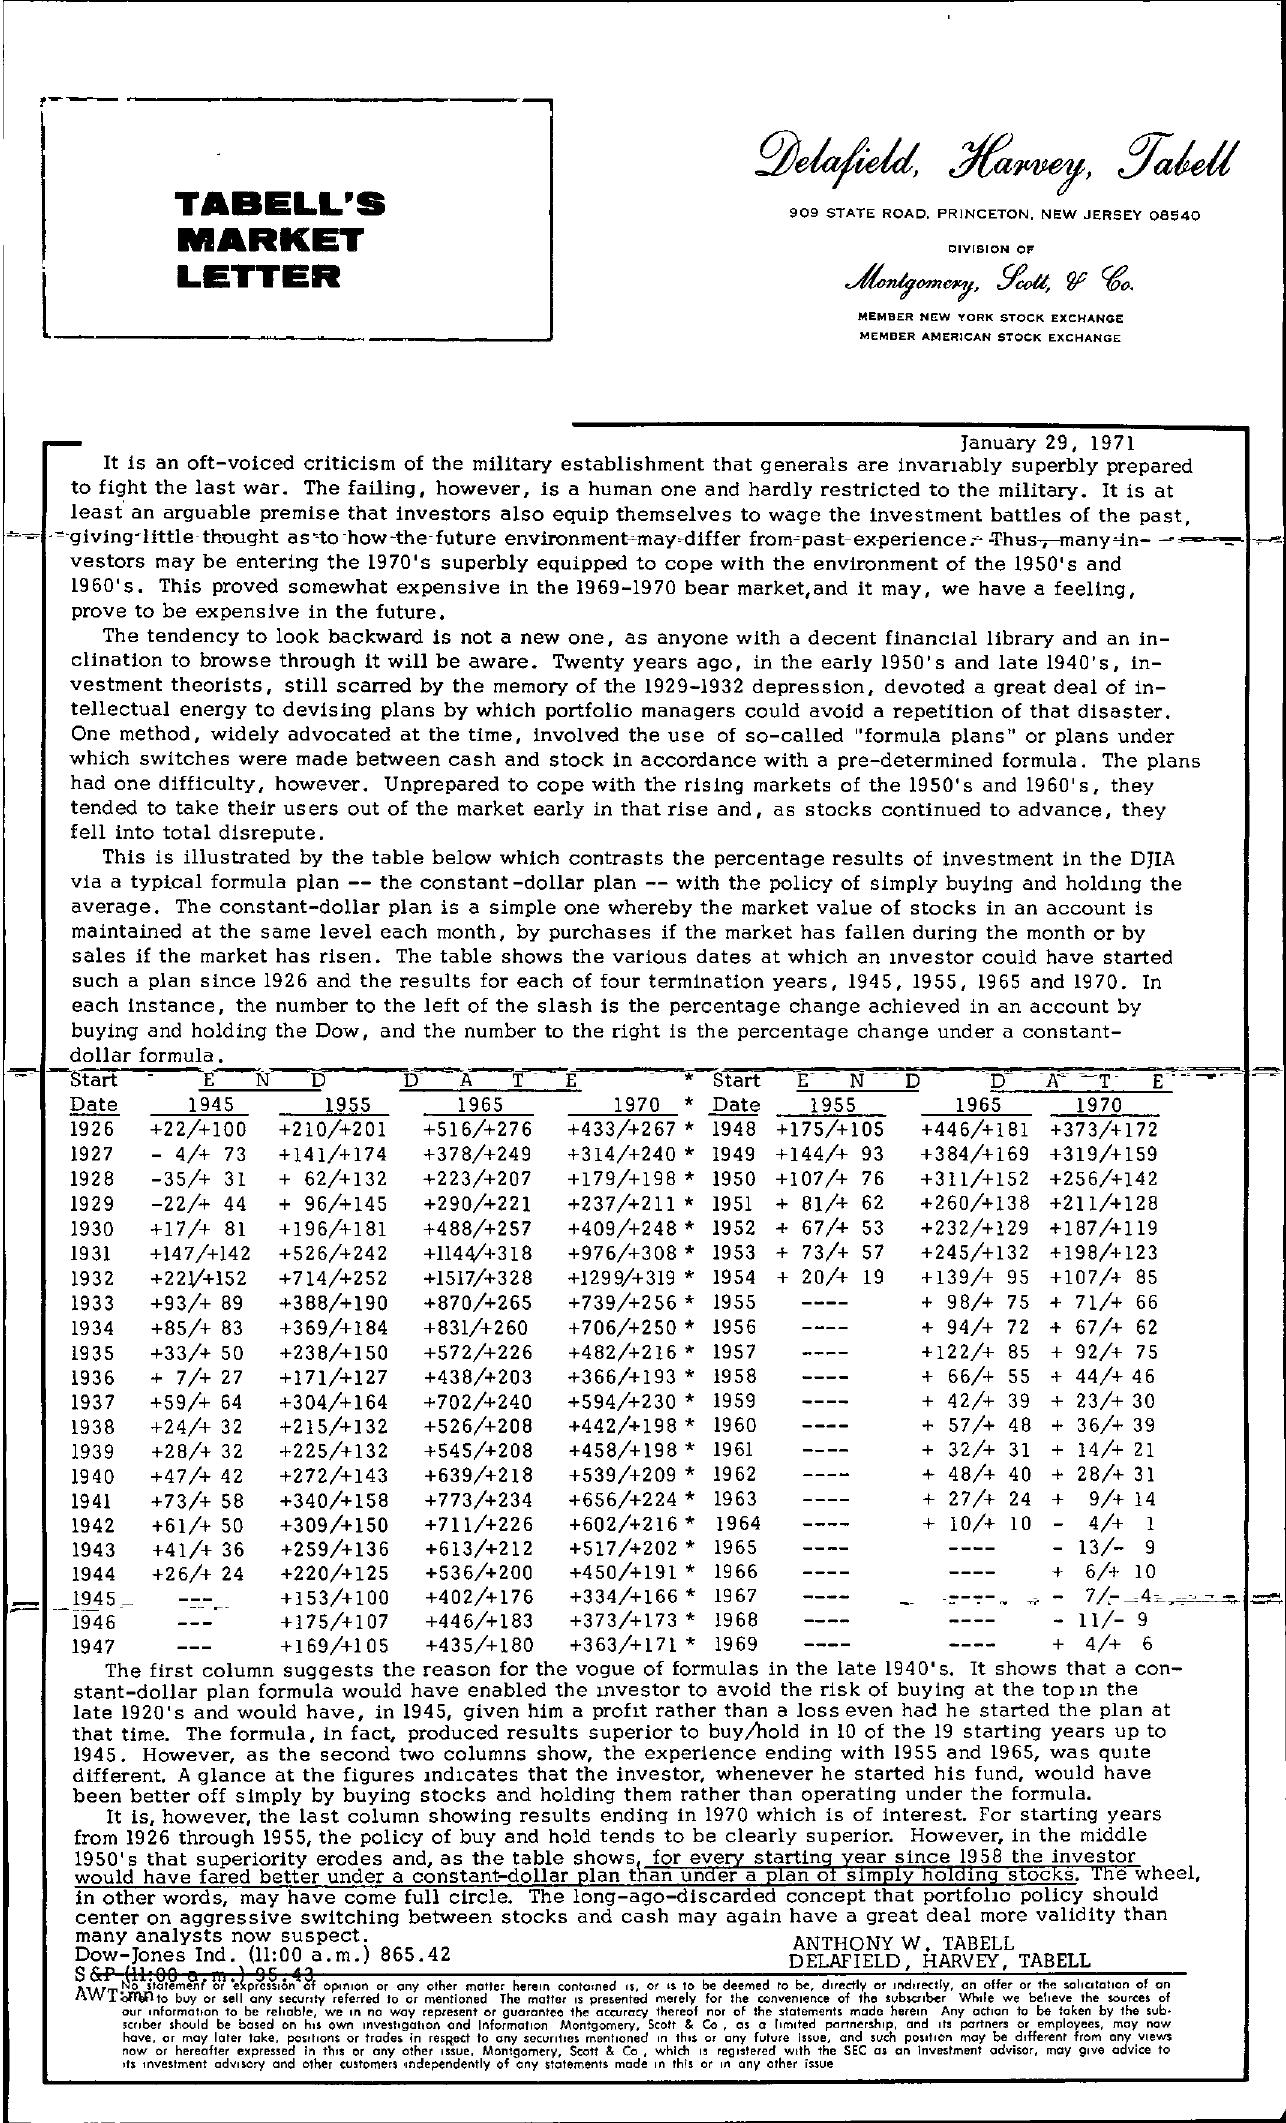 Tabell's Market Letter - January 29, 1971